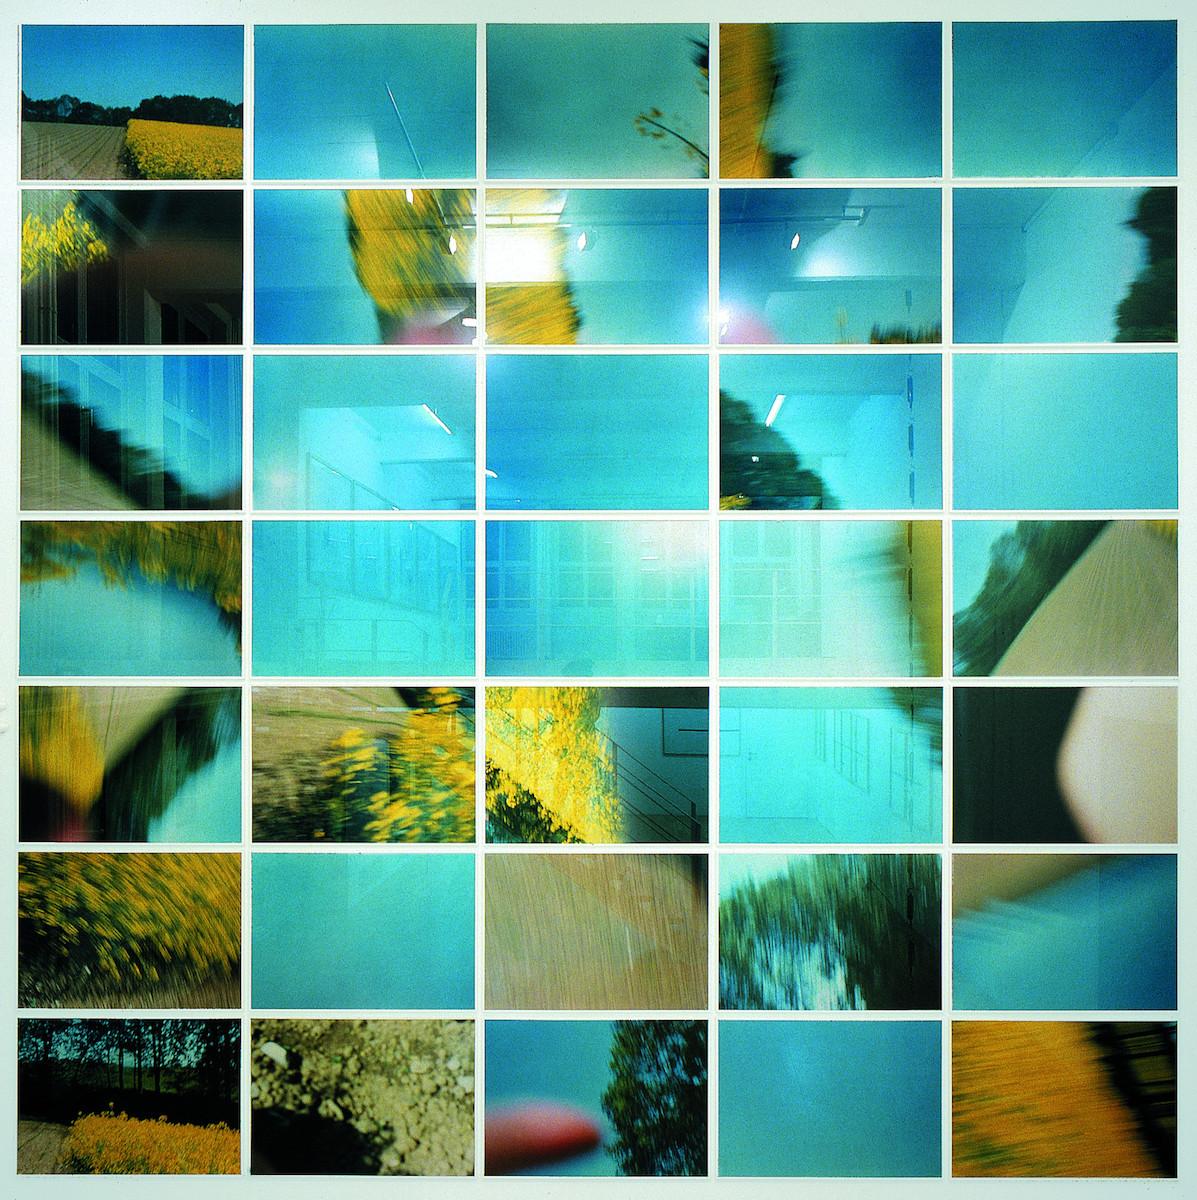 Christoph Rütimann - Chi ha detto che il giallo non è bello (Qui a dit que le jaune n'était pas beau) (1983:90), projet installation in situ, 2018 - Galerie Mai 36